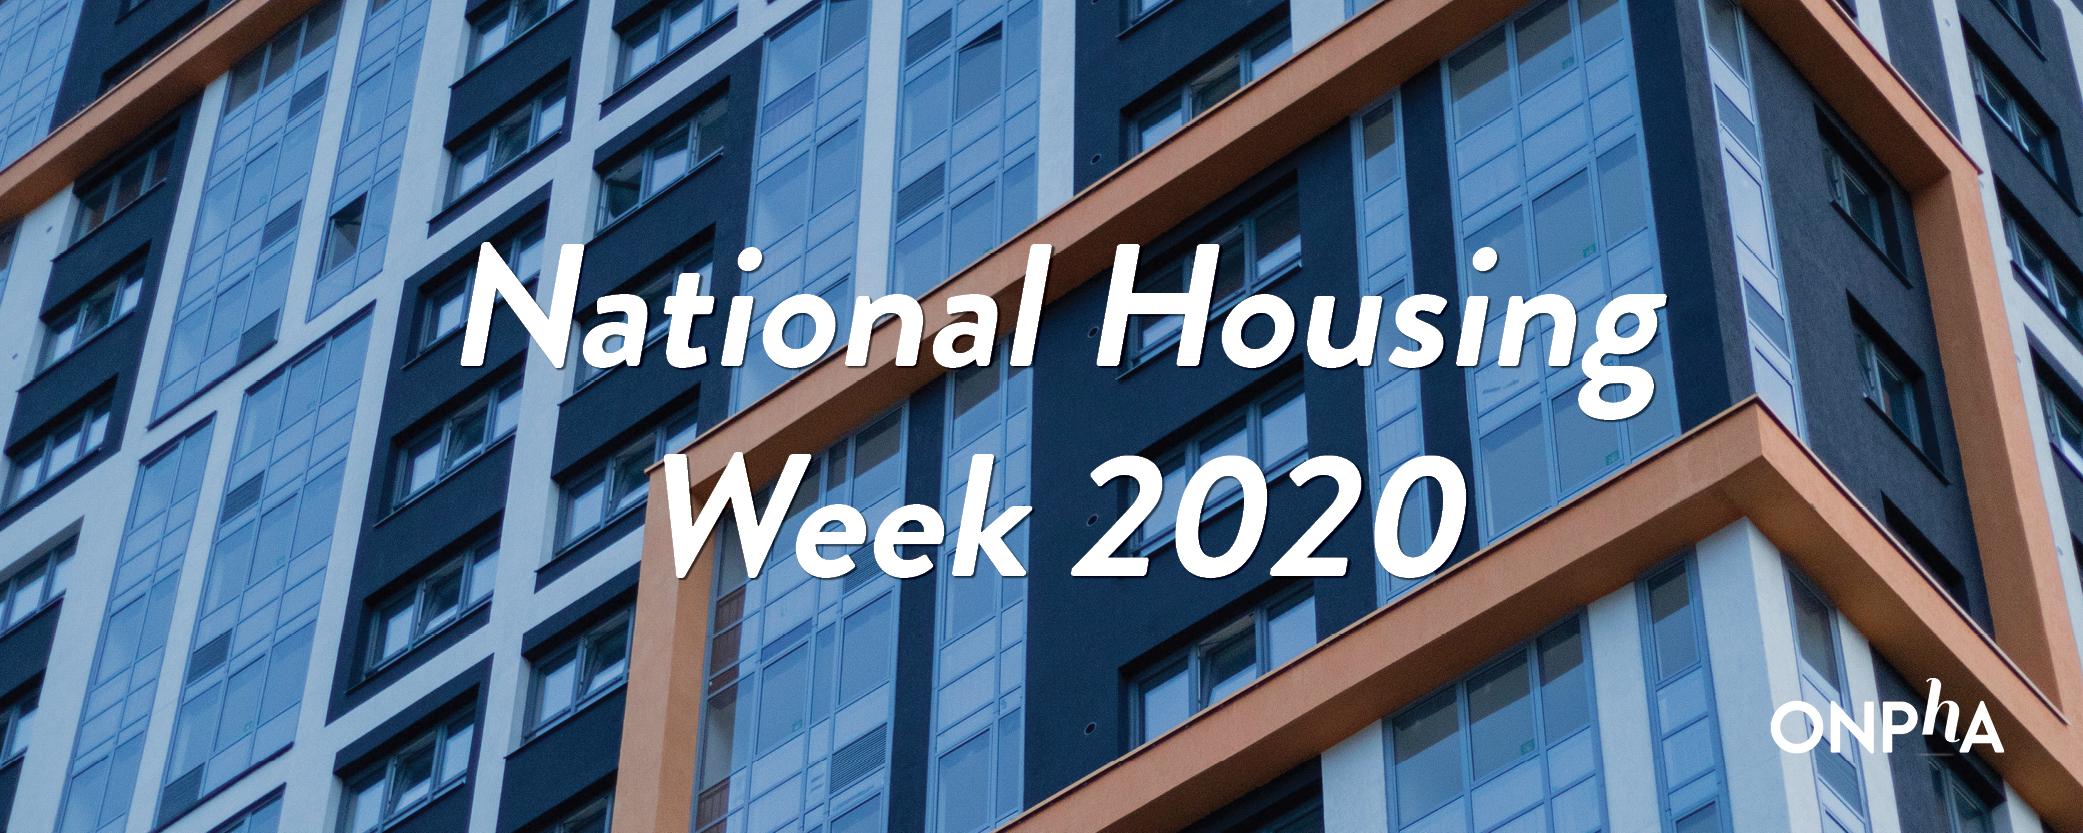 National Housing Week 2020